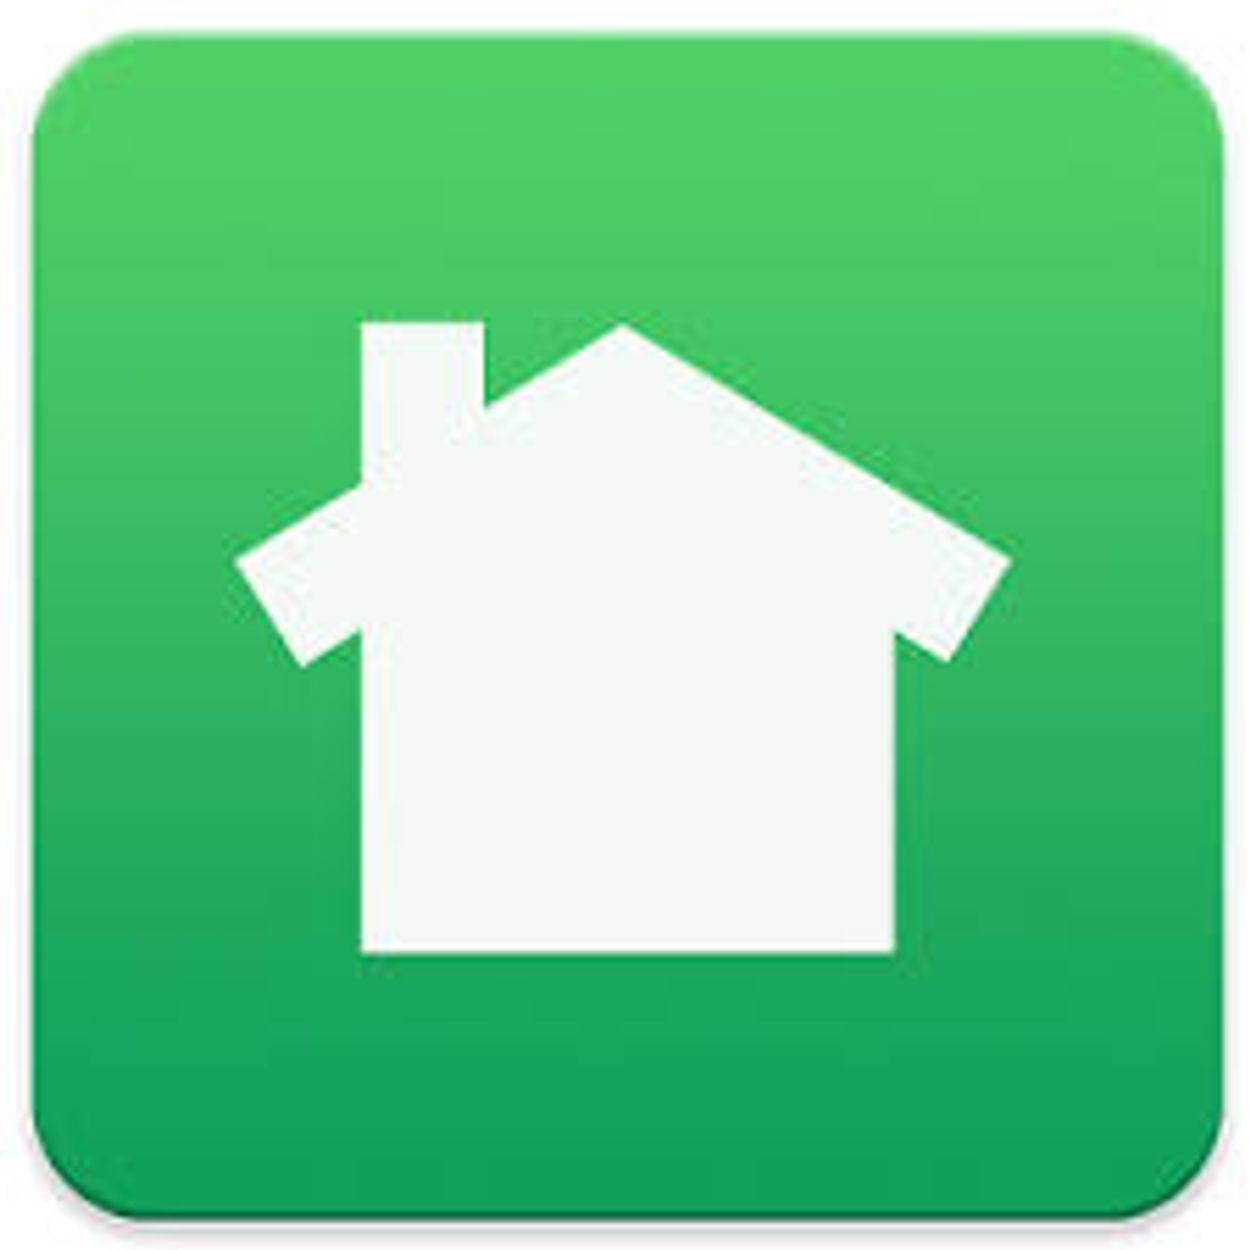 Nextdoor app logo